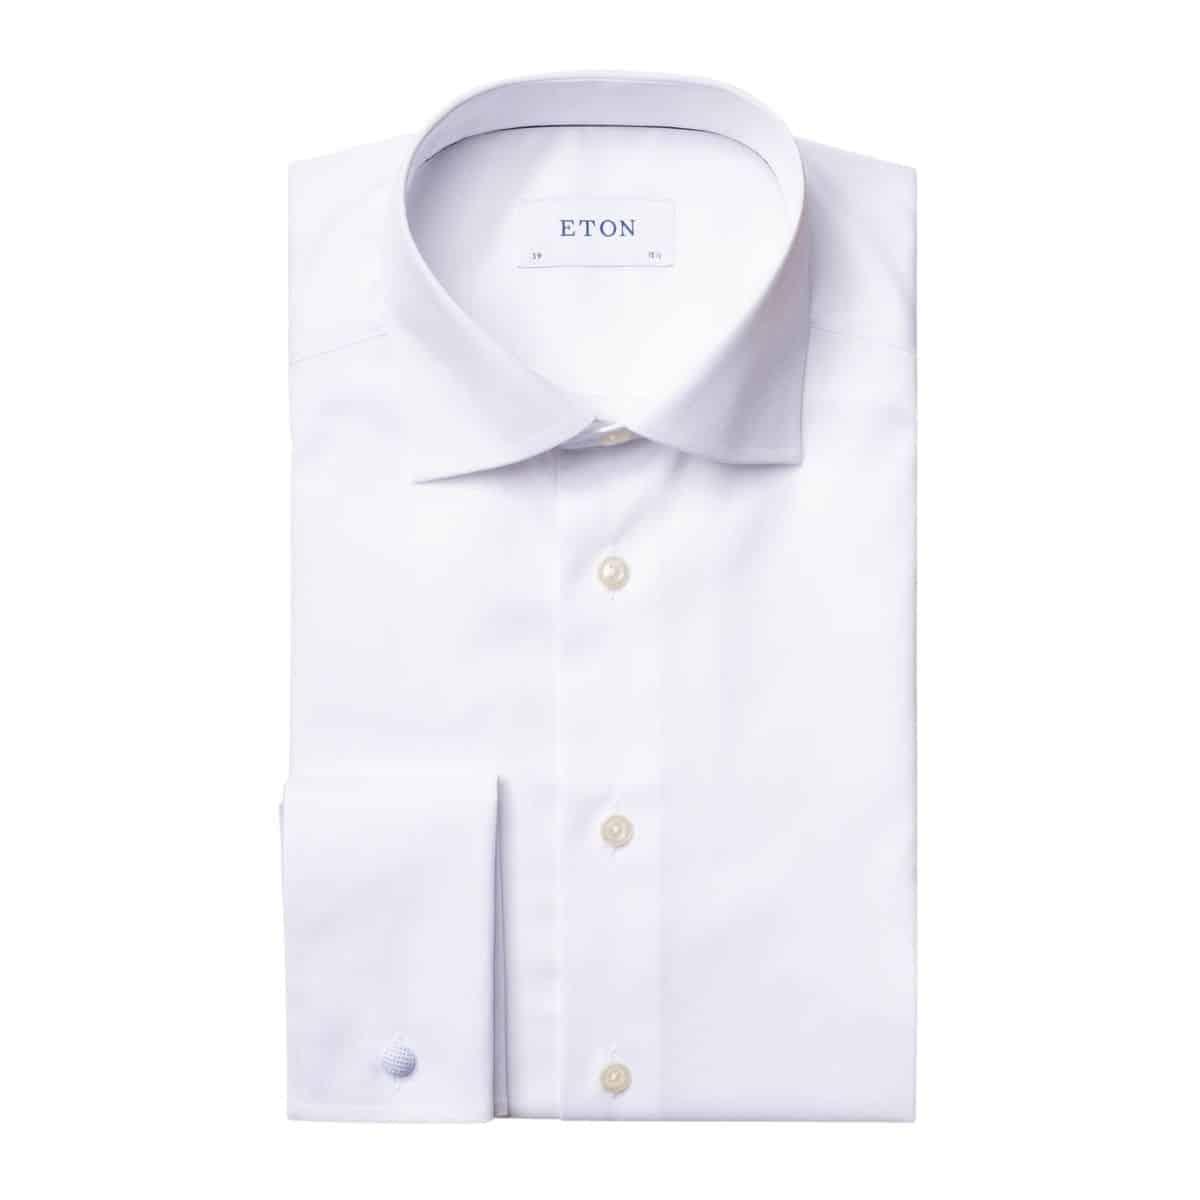 Eton shirt signature twill white french cuff